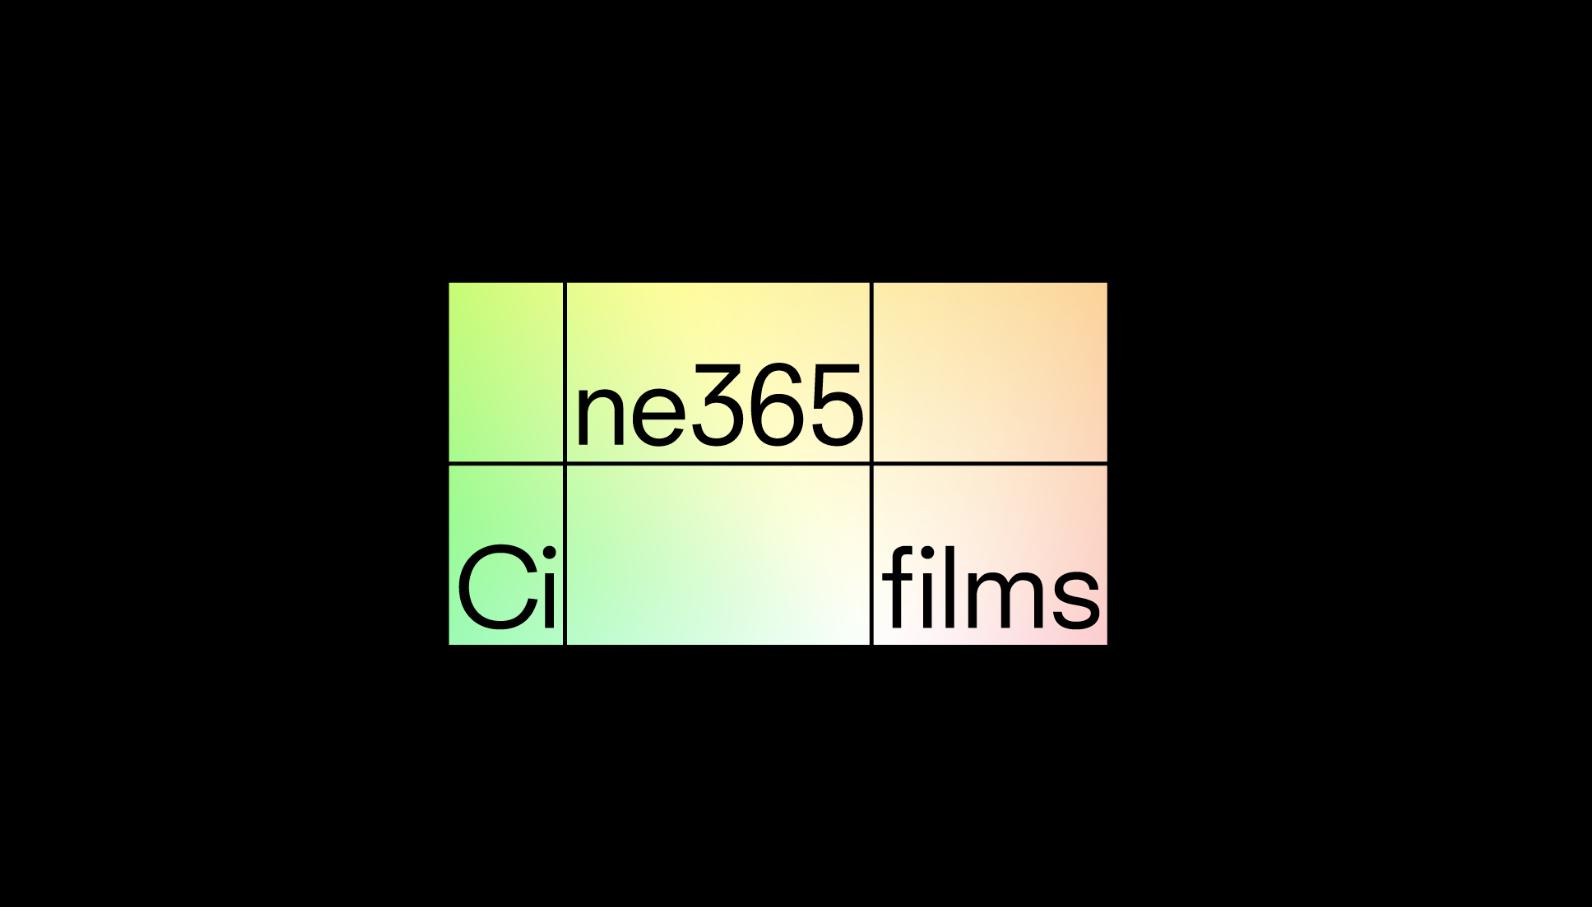 Cine365films